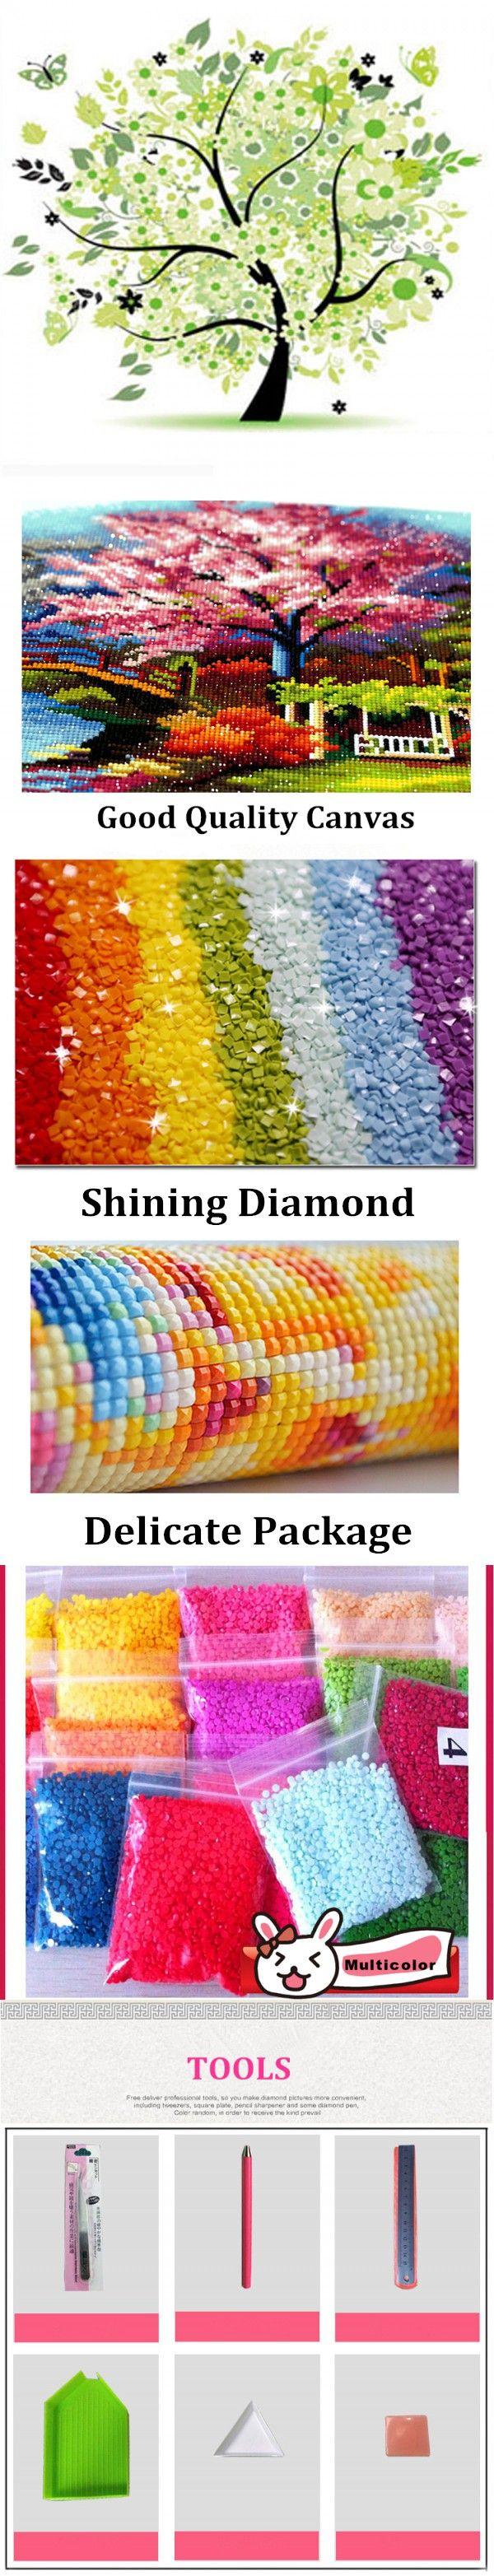 WZW-062 2016 Sale Kits home decor for Embroidery Diy Diamond Painting Lucky tree spring Handicraft Inlay Fabric 30X28CM $15.88